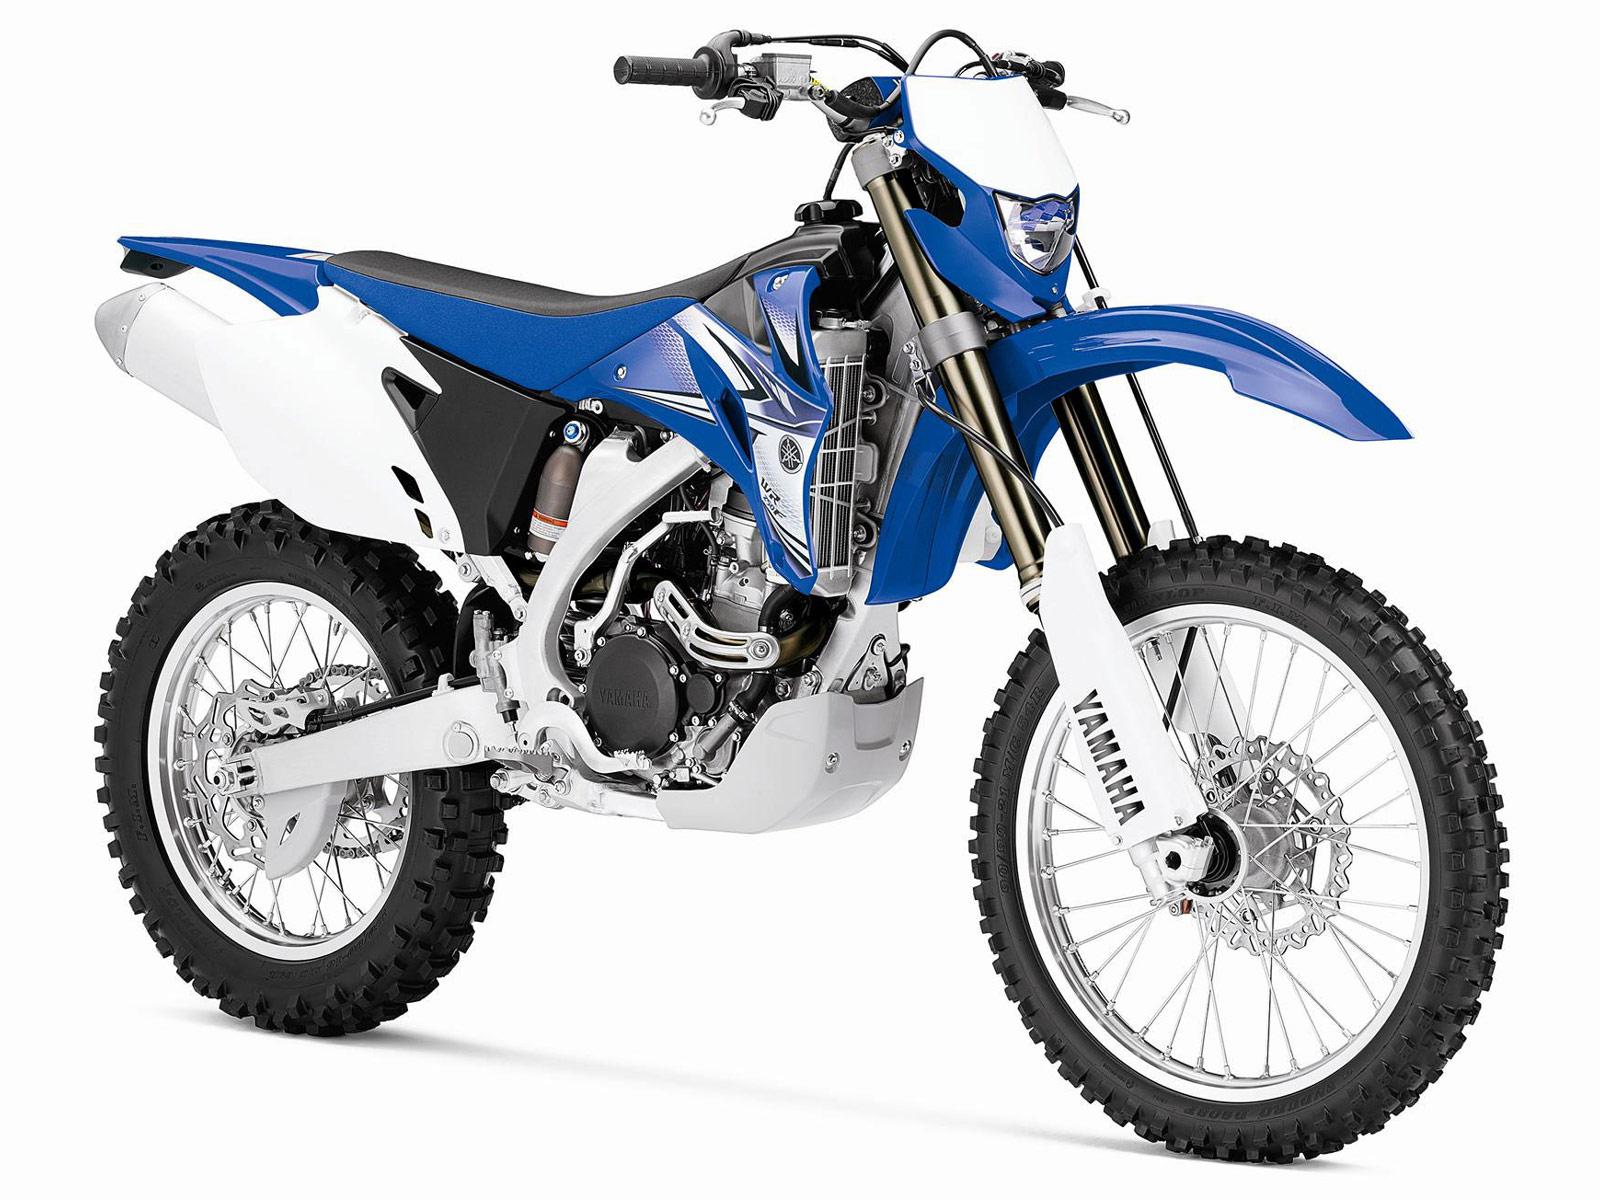 2012 YAMAHA WR250F Motorcycle Desktop Wallpapers